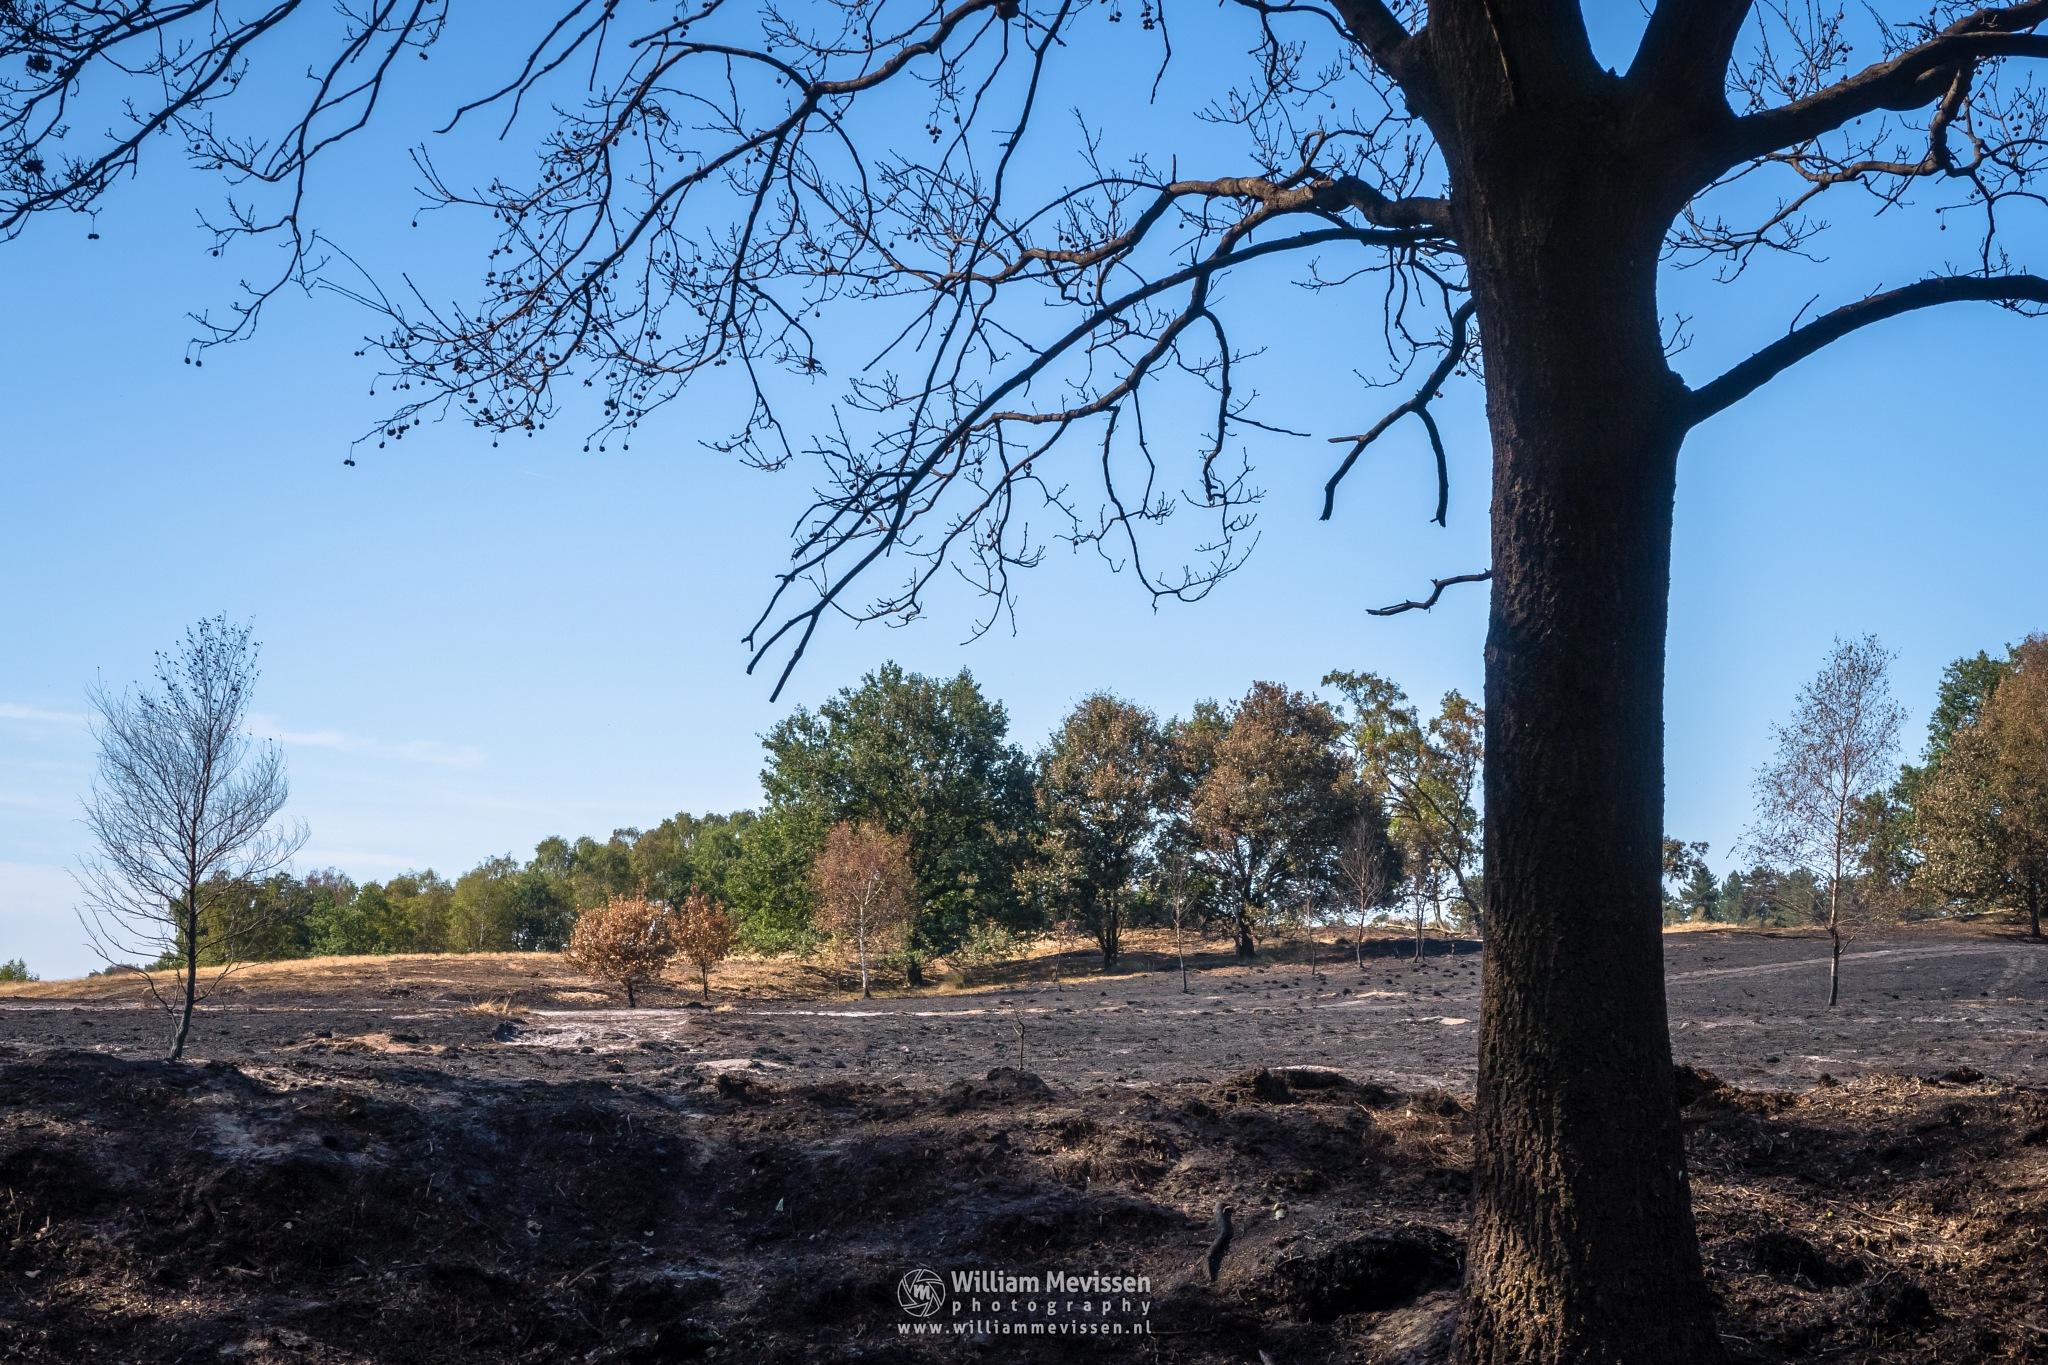 Burned Land by William Mevissen